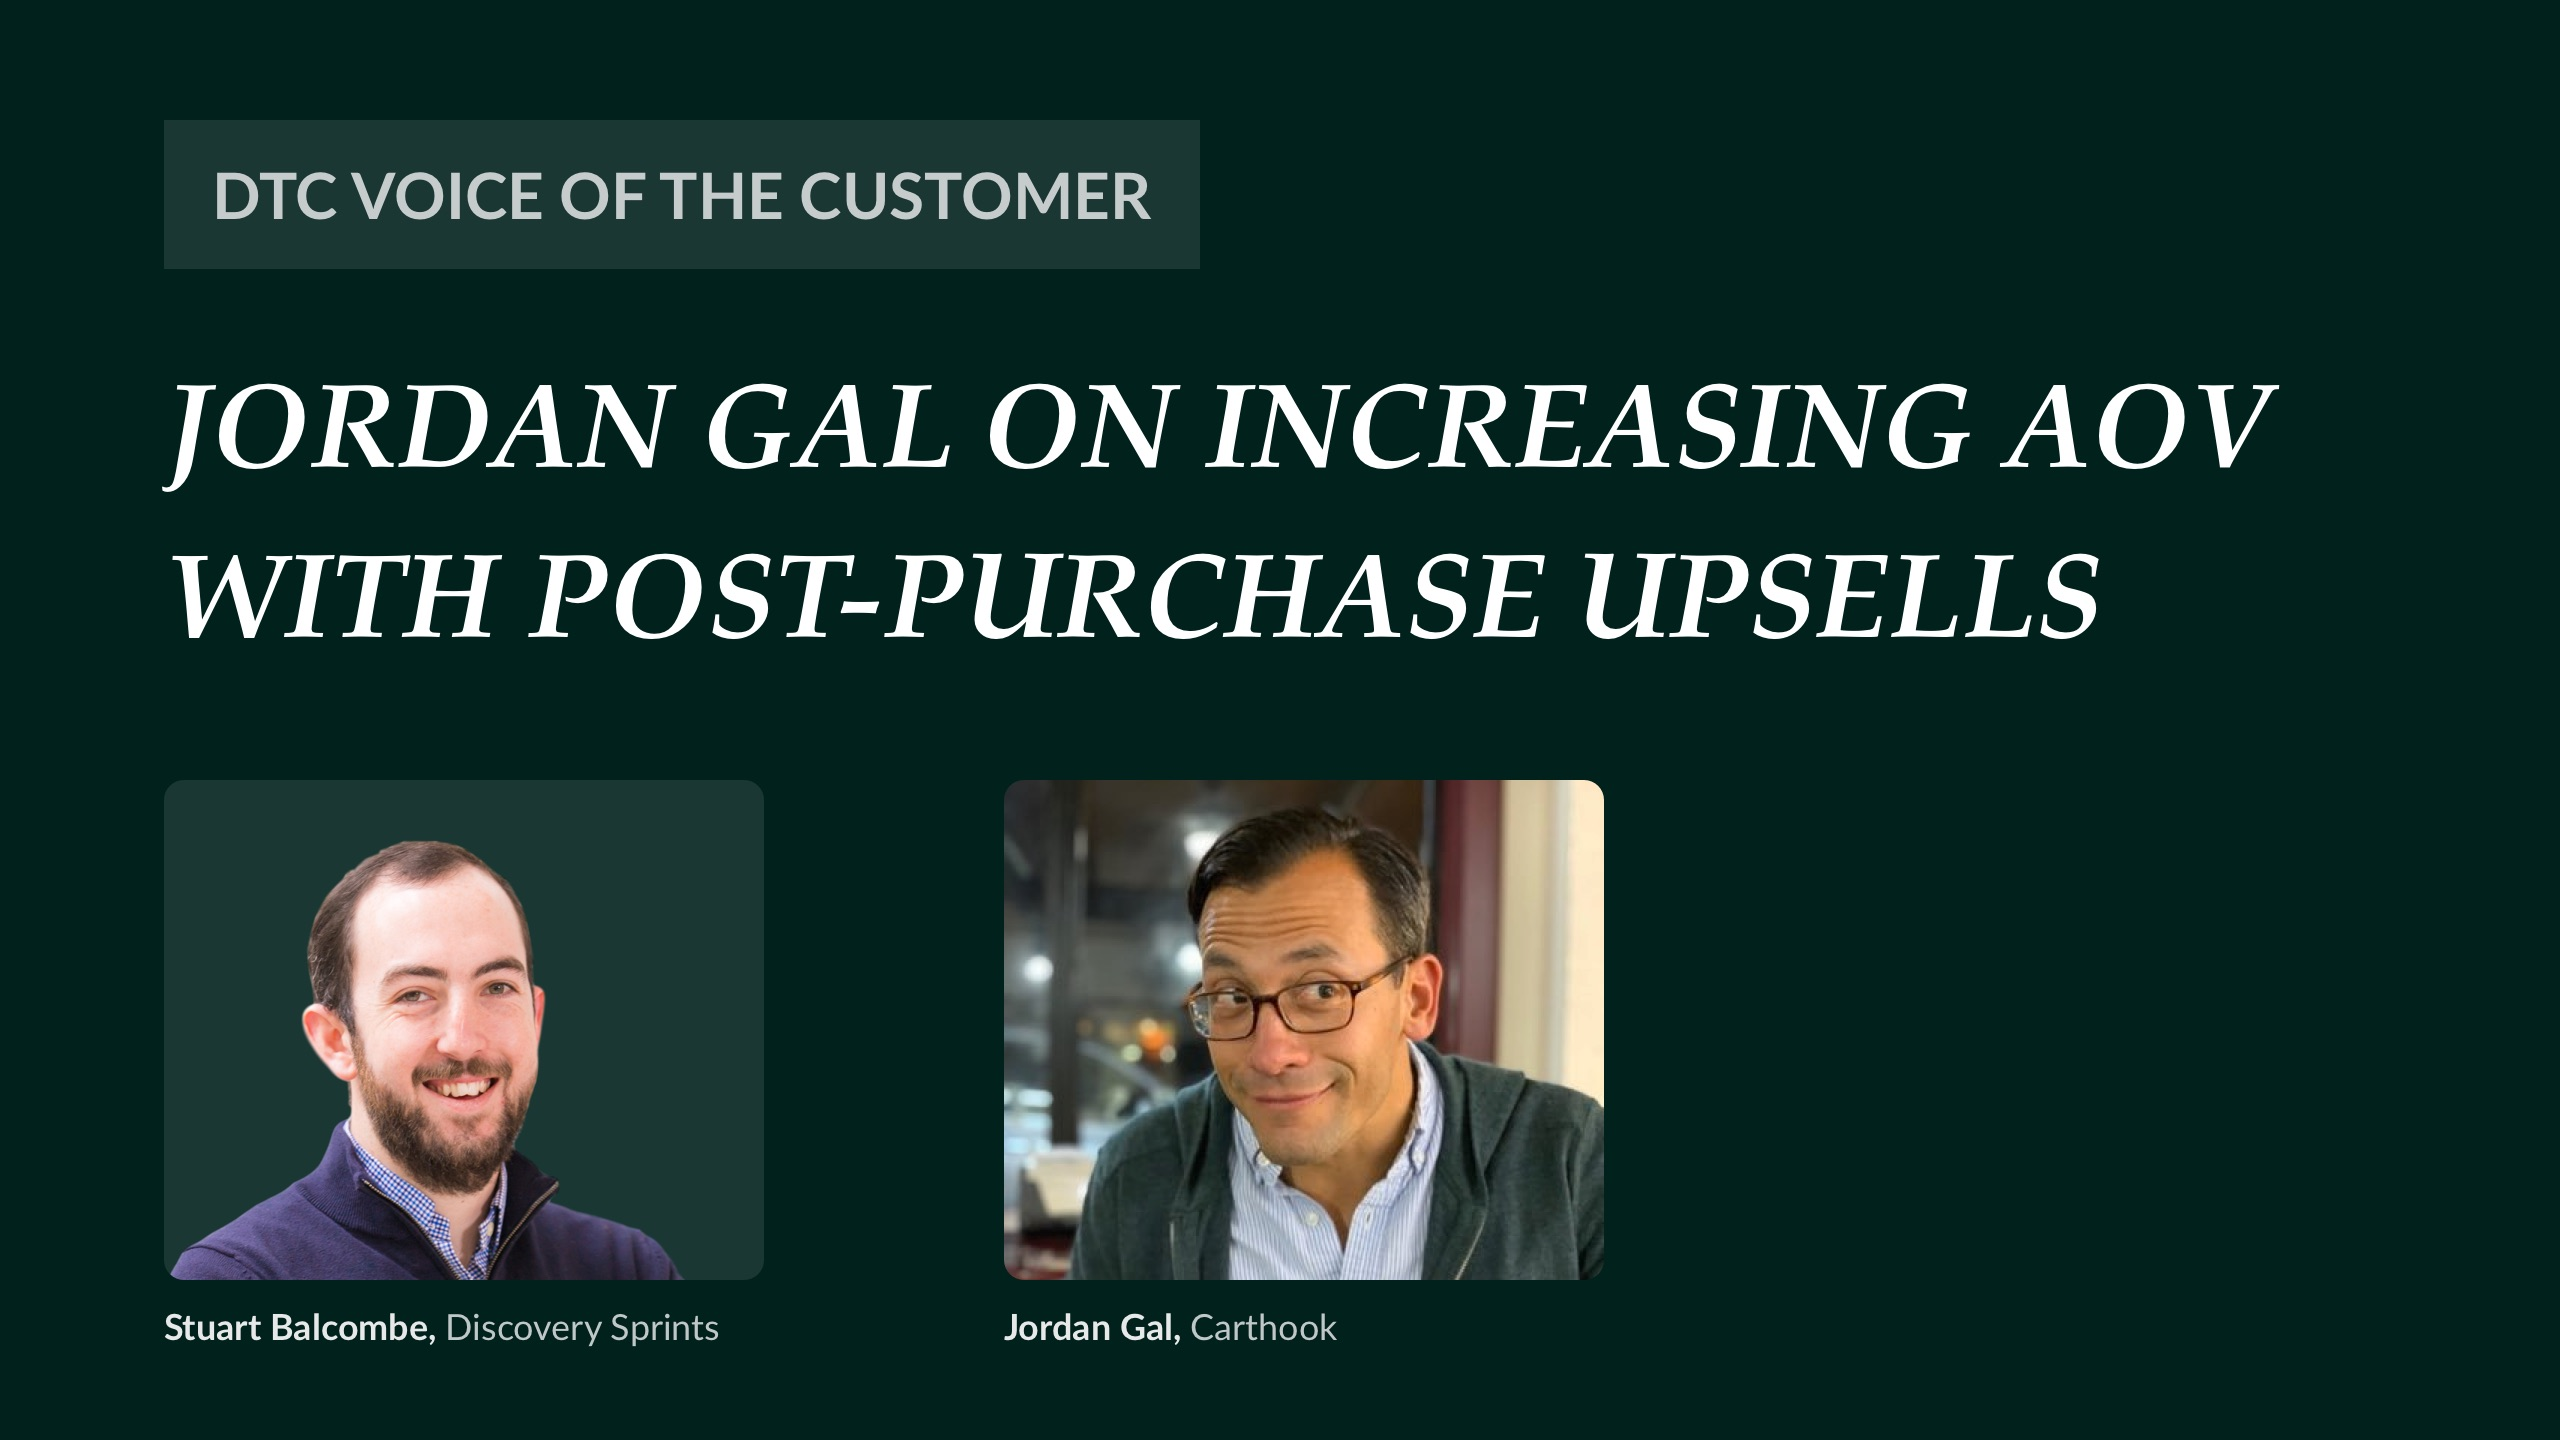 Jordan Gal on increasing AOV with post-purchase upsells